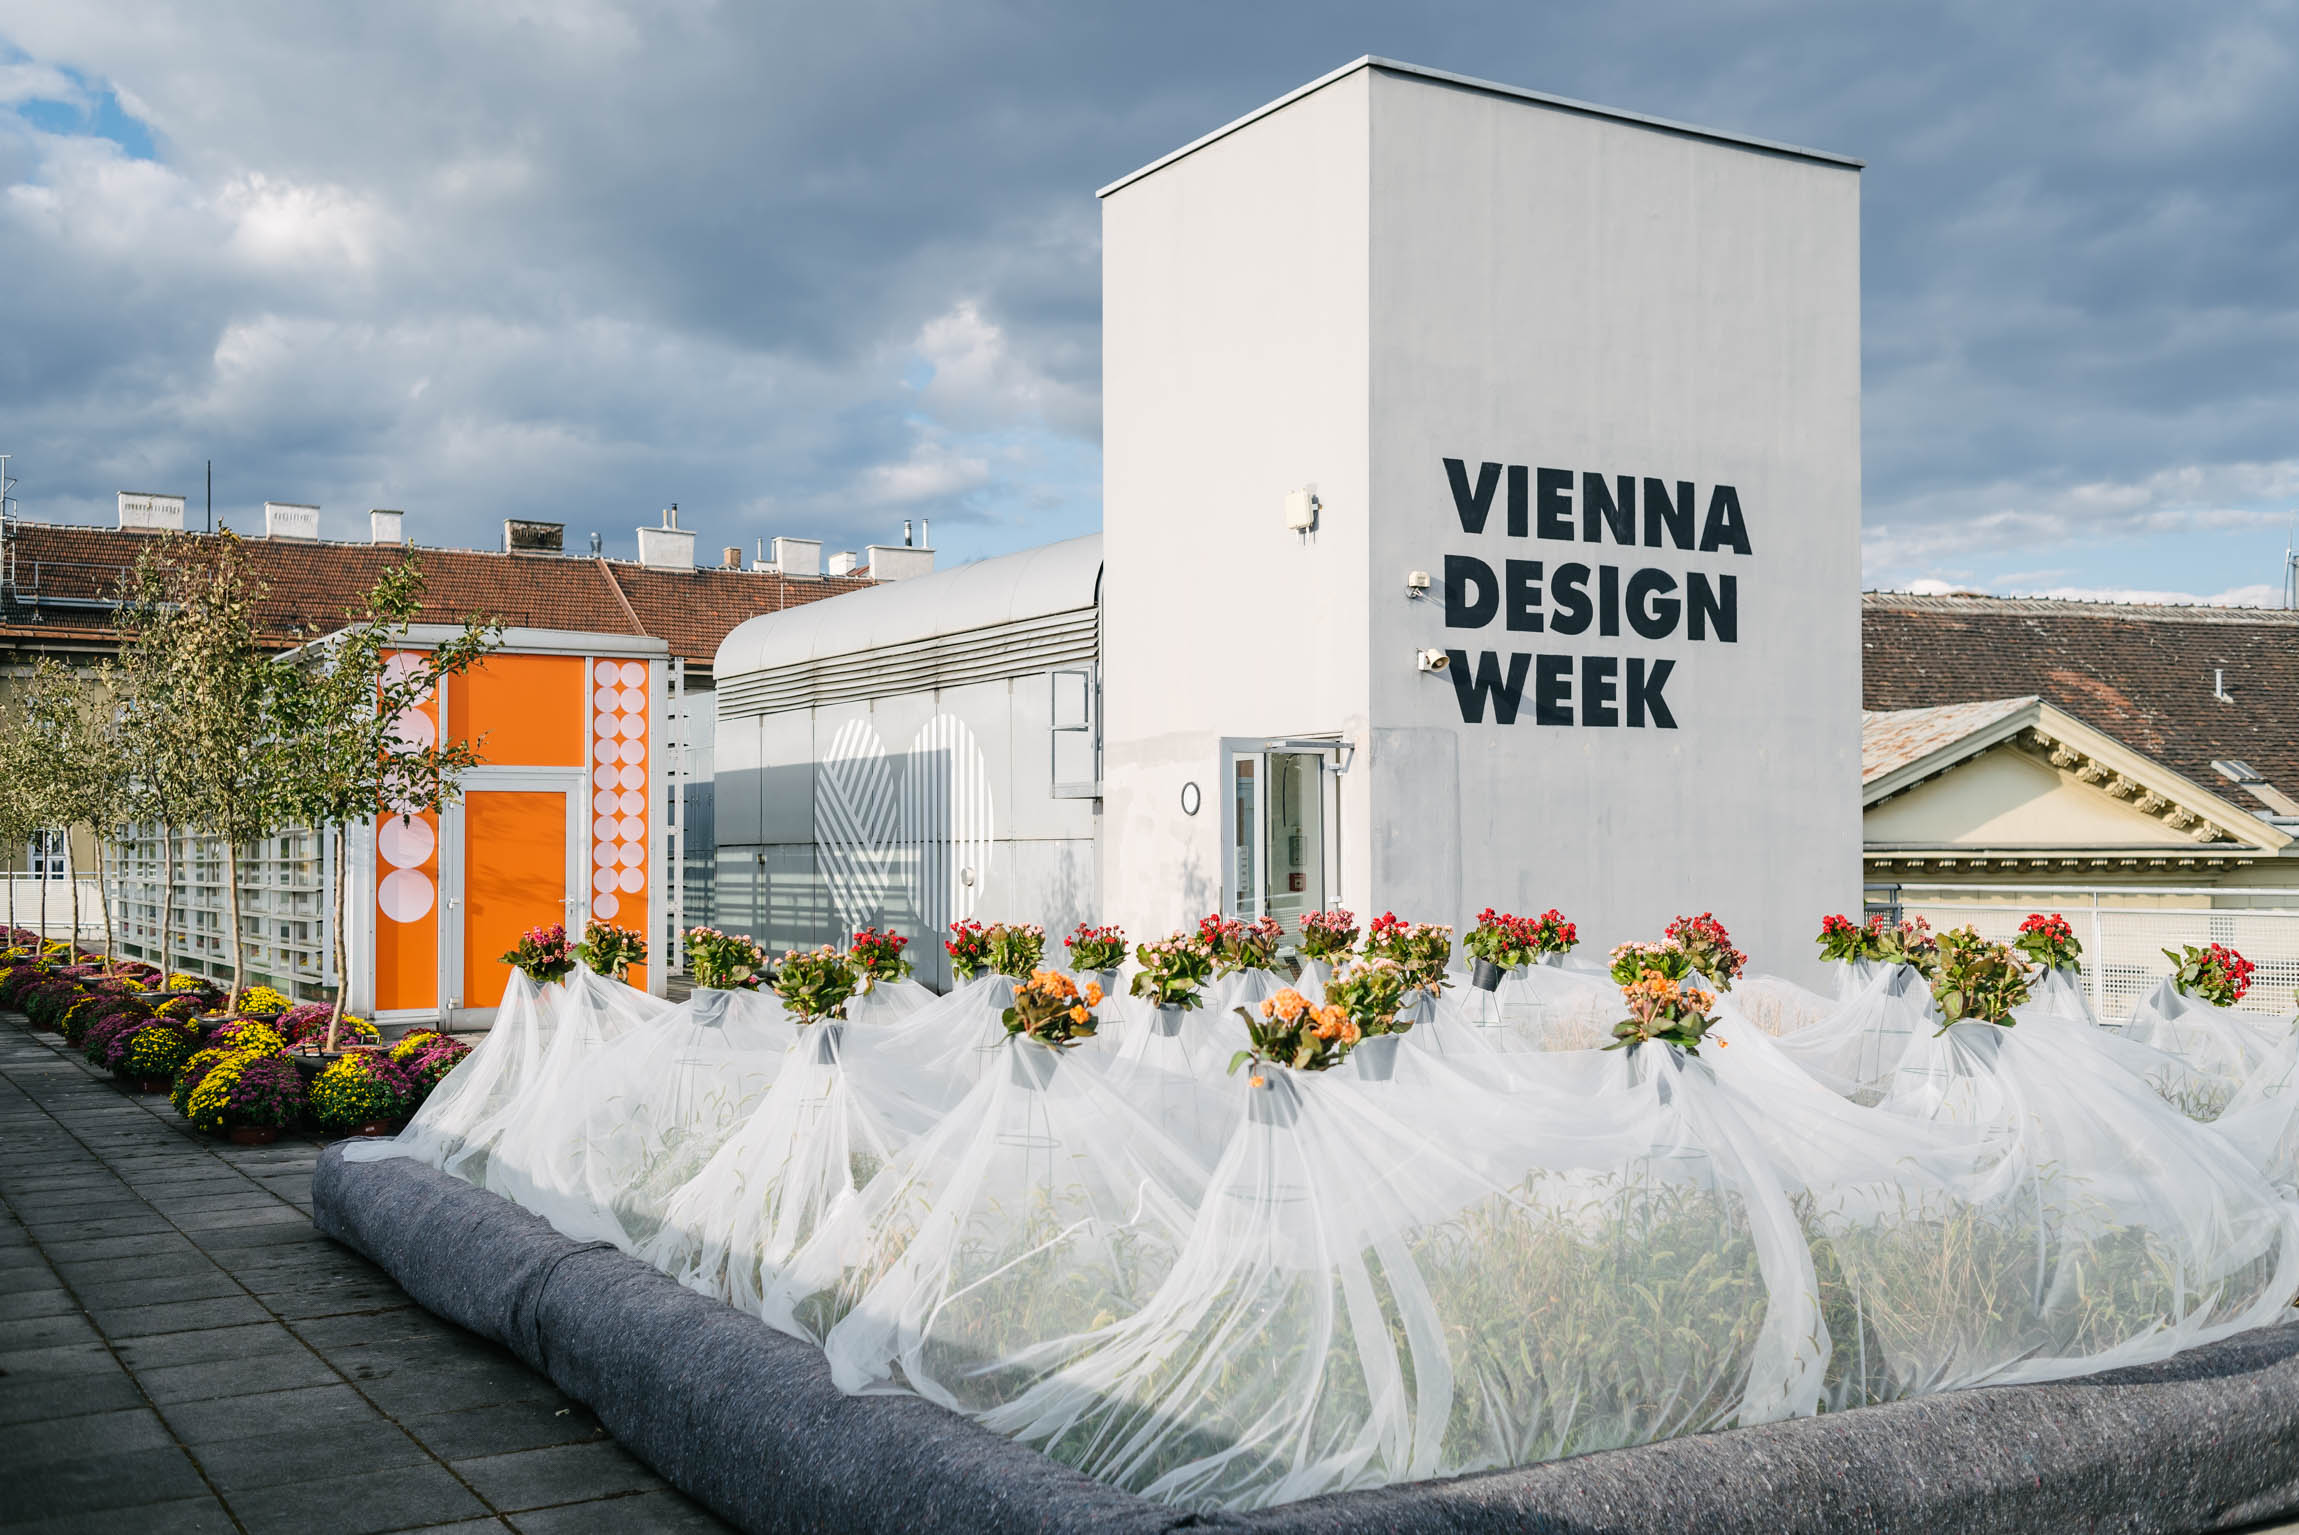 VIENNA DESIGN GARDEN  bellaflora, Auböck + Kárász